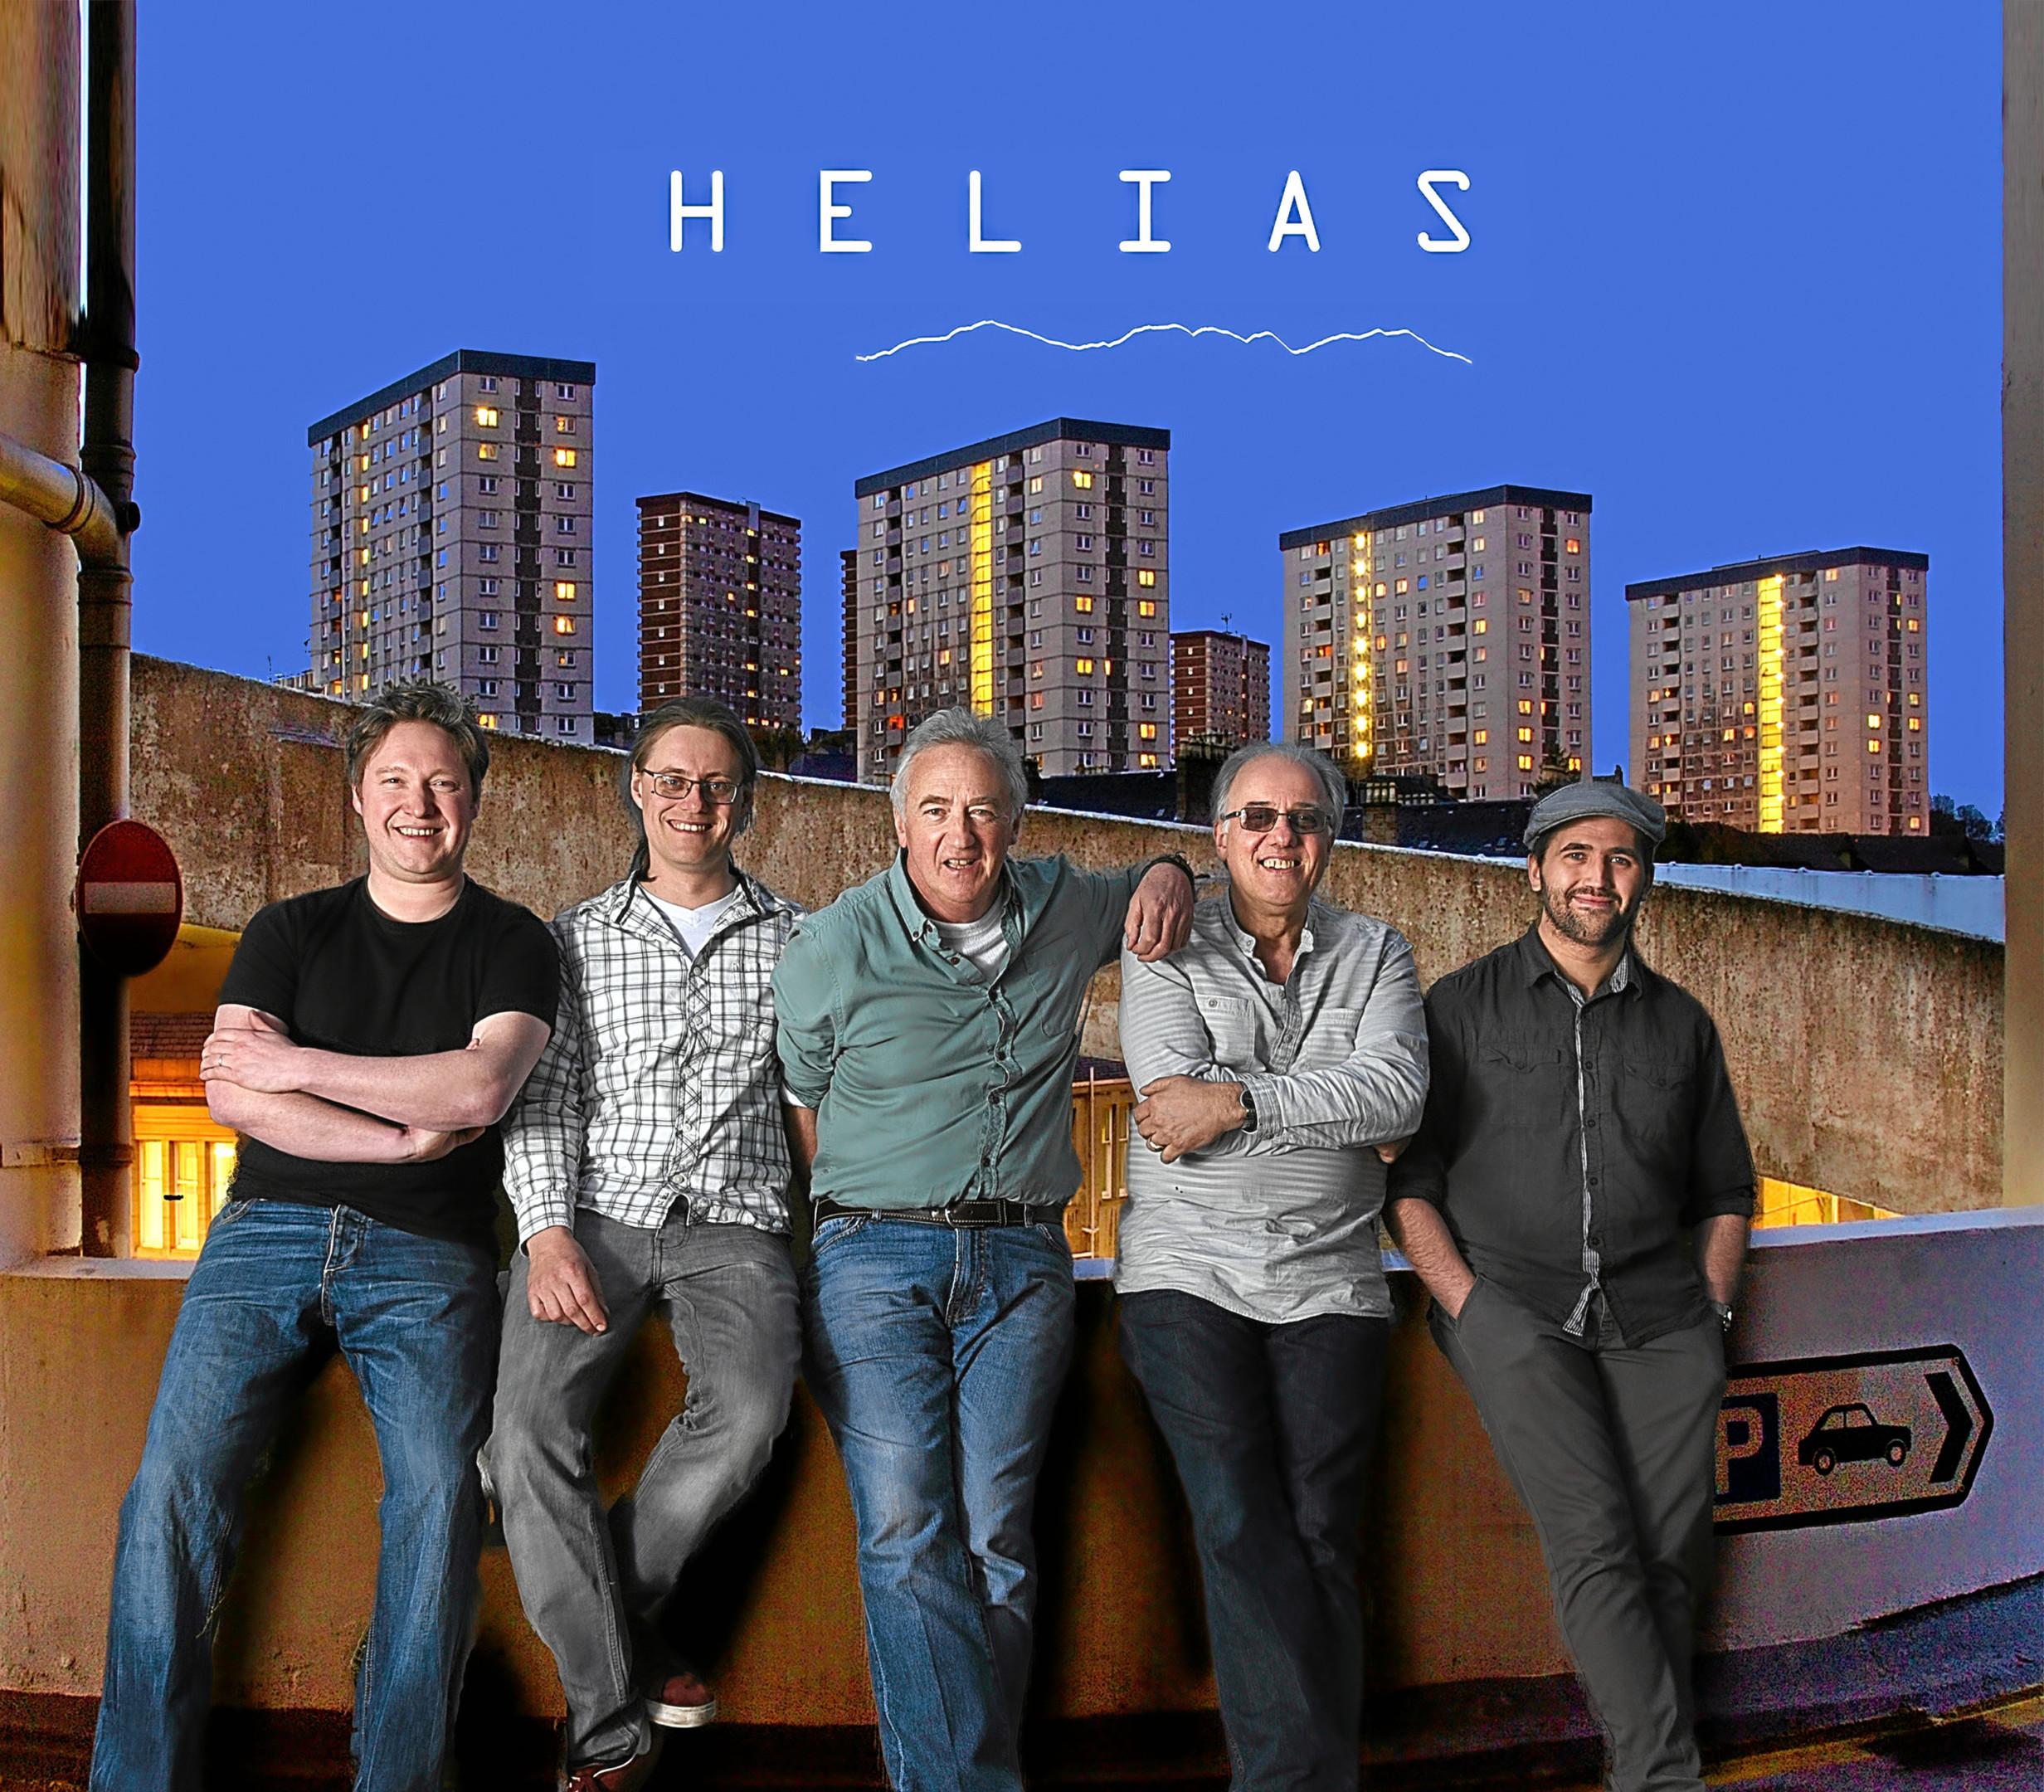 Helias - Leon Thorne, Ruairidh McClean,  Simon Jauncey, Pete Caban, Doug Alec Rees.